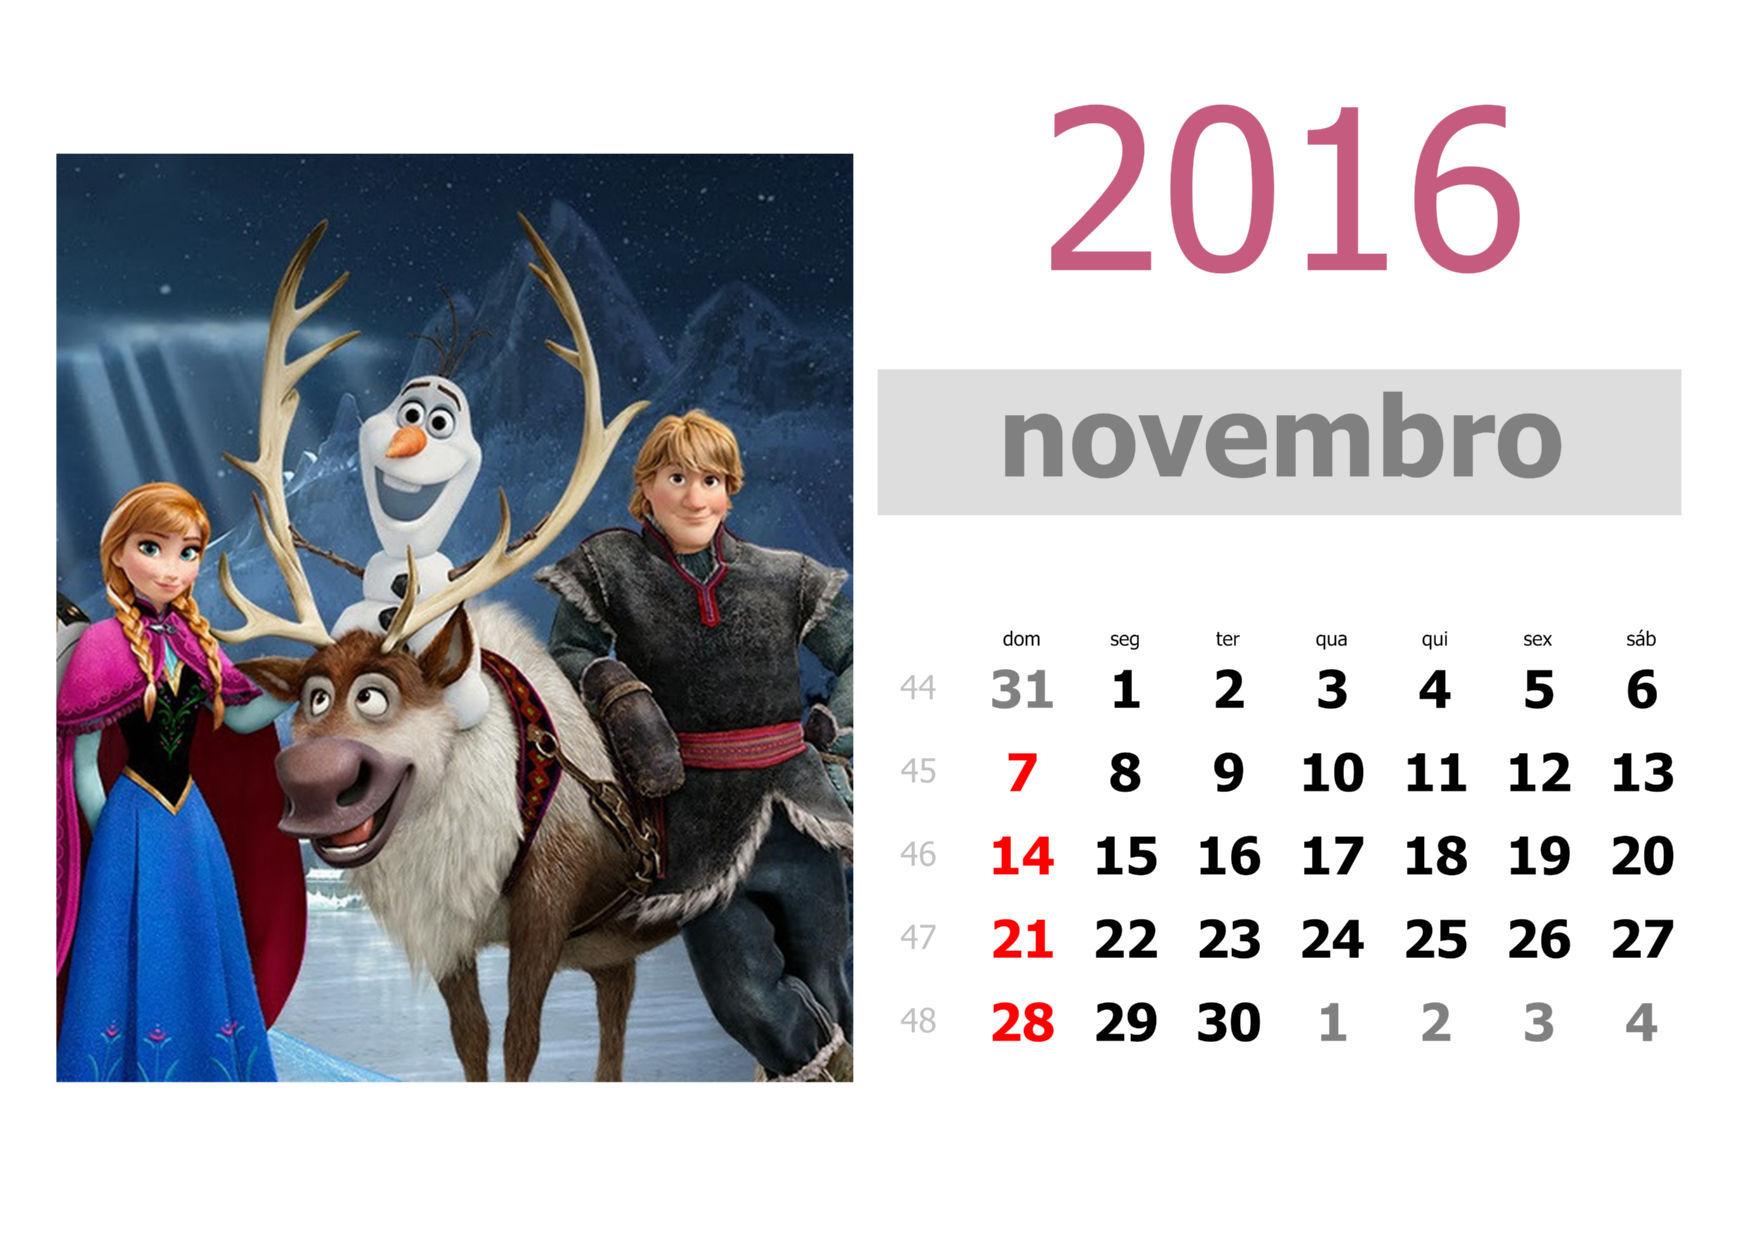 Calendario Do Brasil 2016 Para Imprimir | Calendar Template 2016